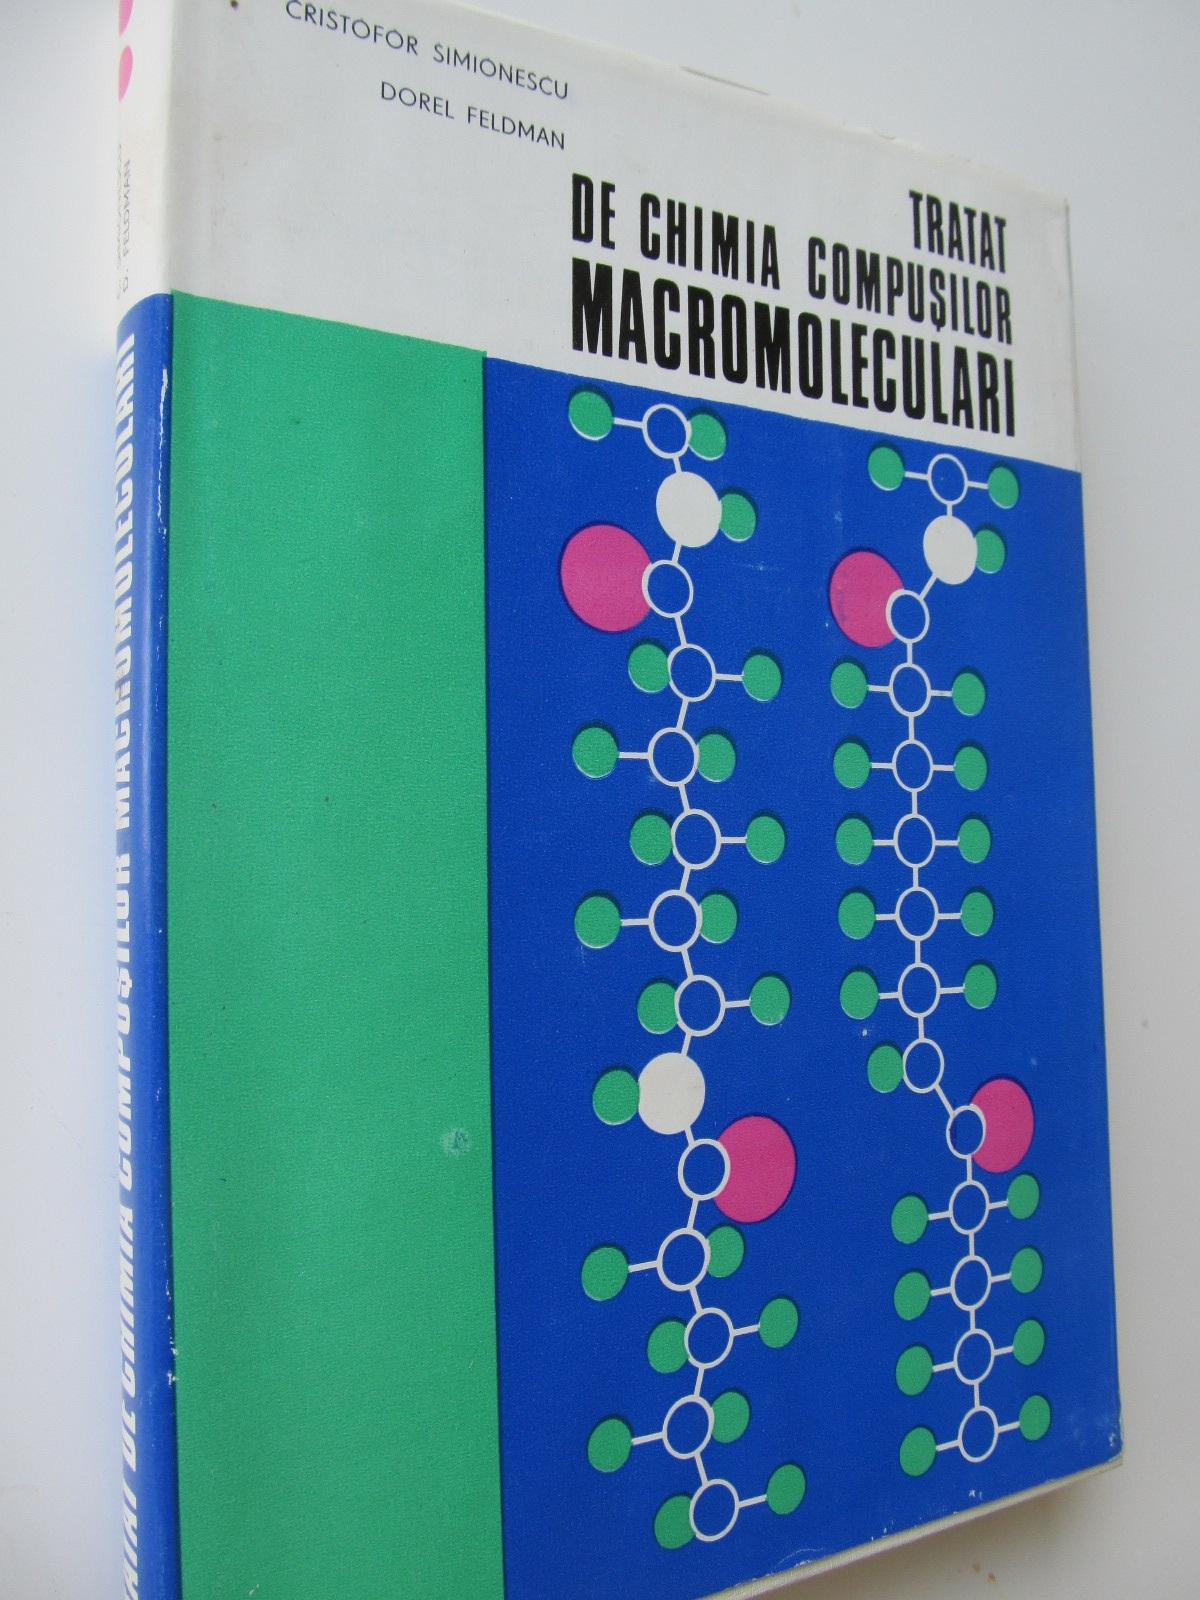 Tratat de chimia compusilor macromoleculari (vol. II) - Cristofor Simionescu ,Dorel Feldman | Detalii carte